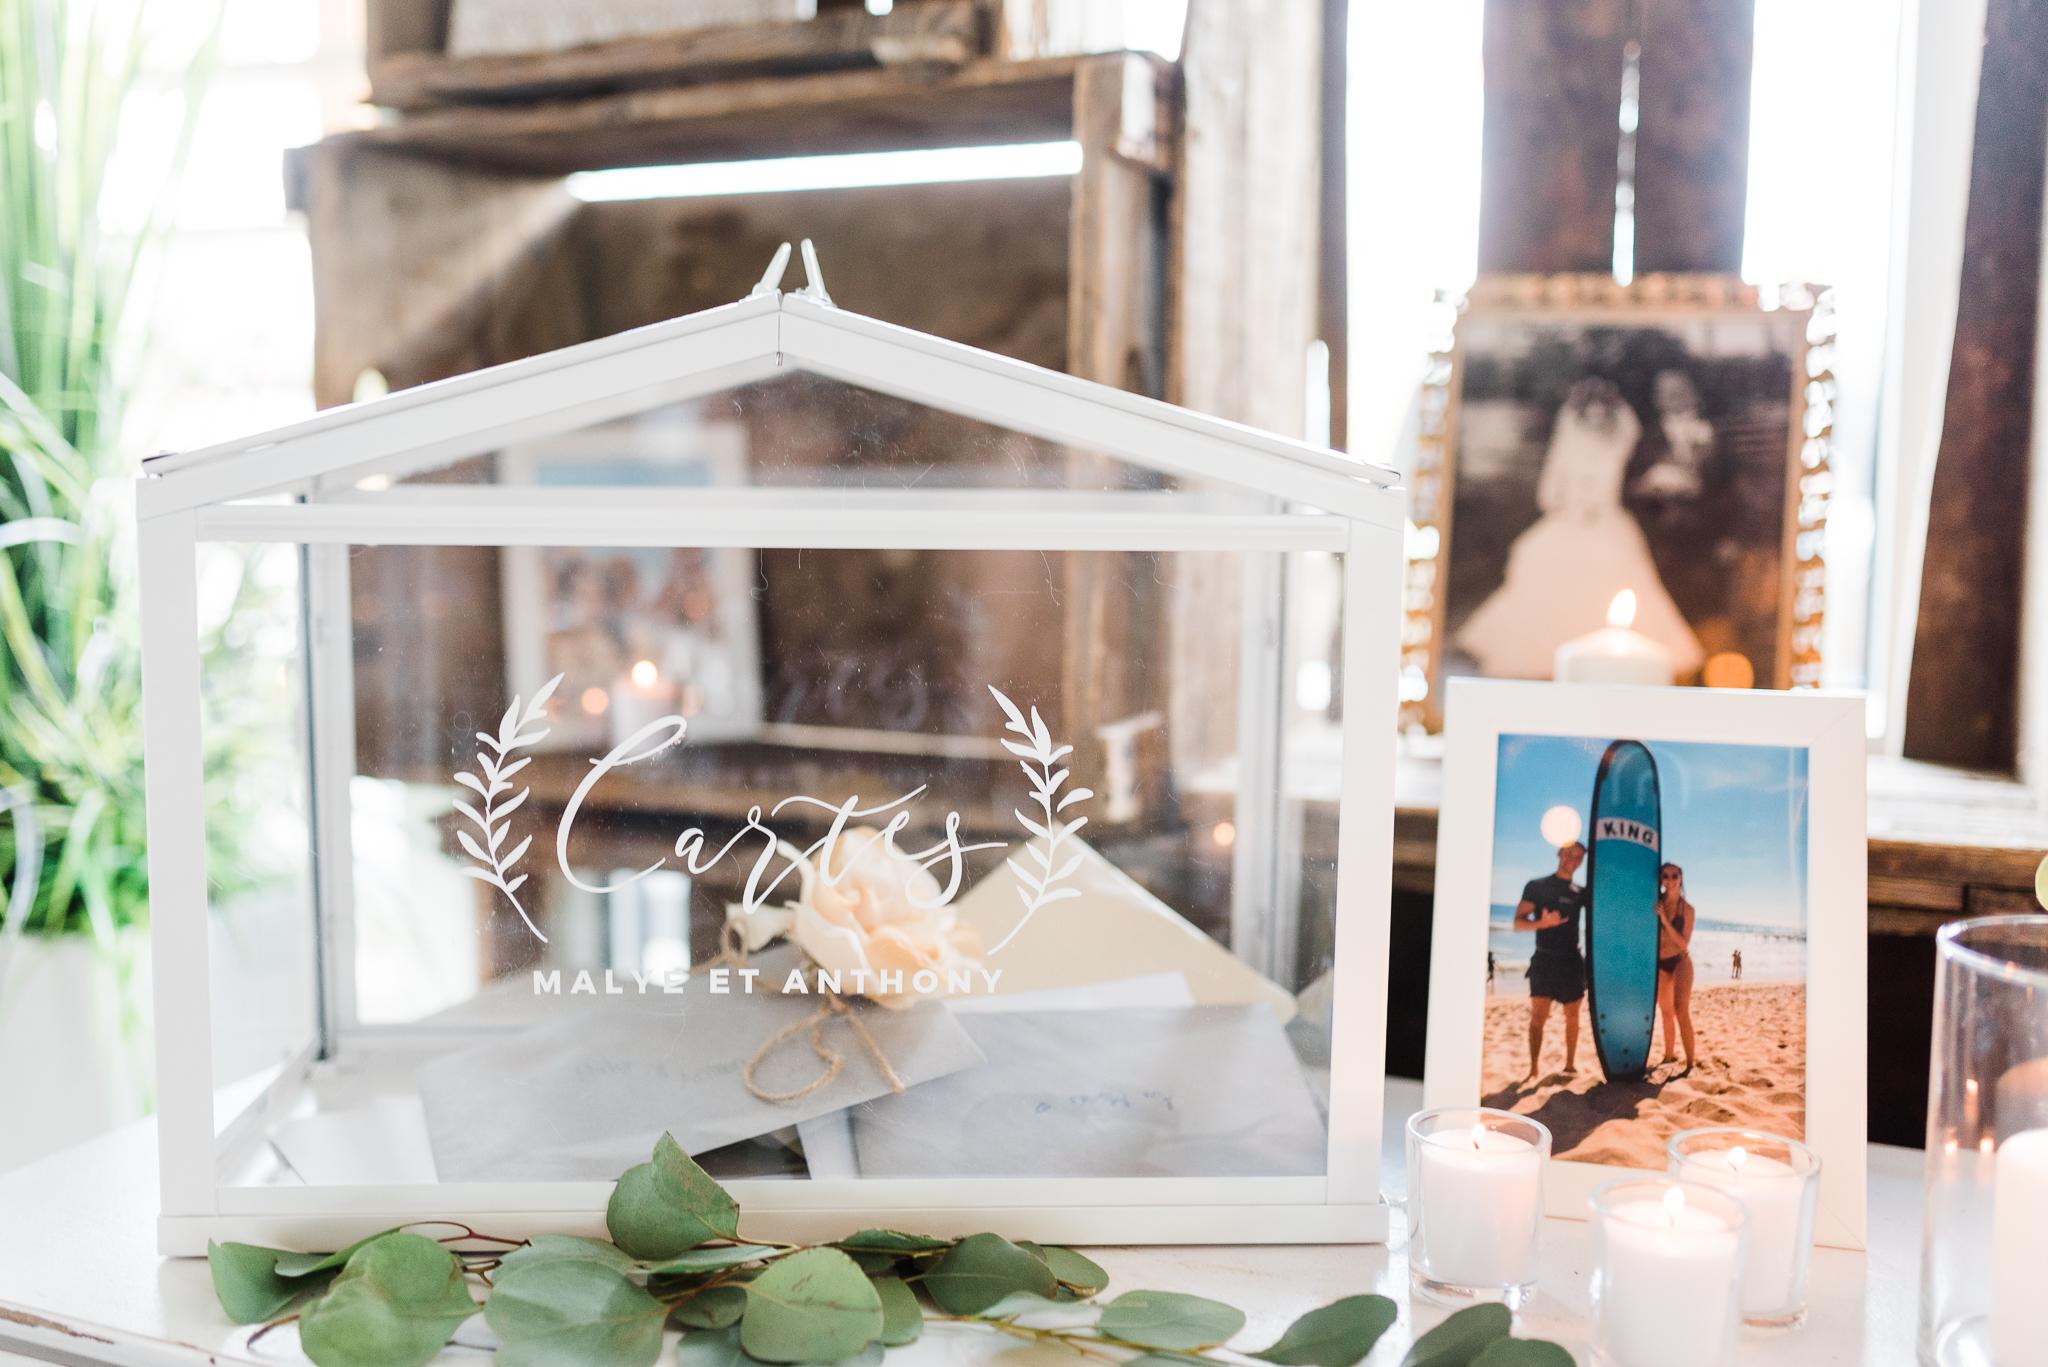 photo mariage quai du cap blanc quebec reception inspiration toscane elisa photographe 2634 - MALYE + ANTHONY | Québec, Salle du Quai du Cap Blanc | Photographe de mariage | Elisa Photography